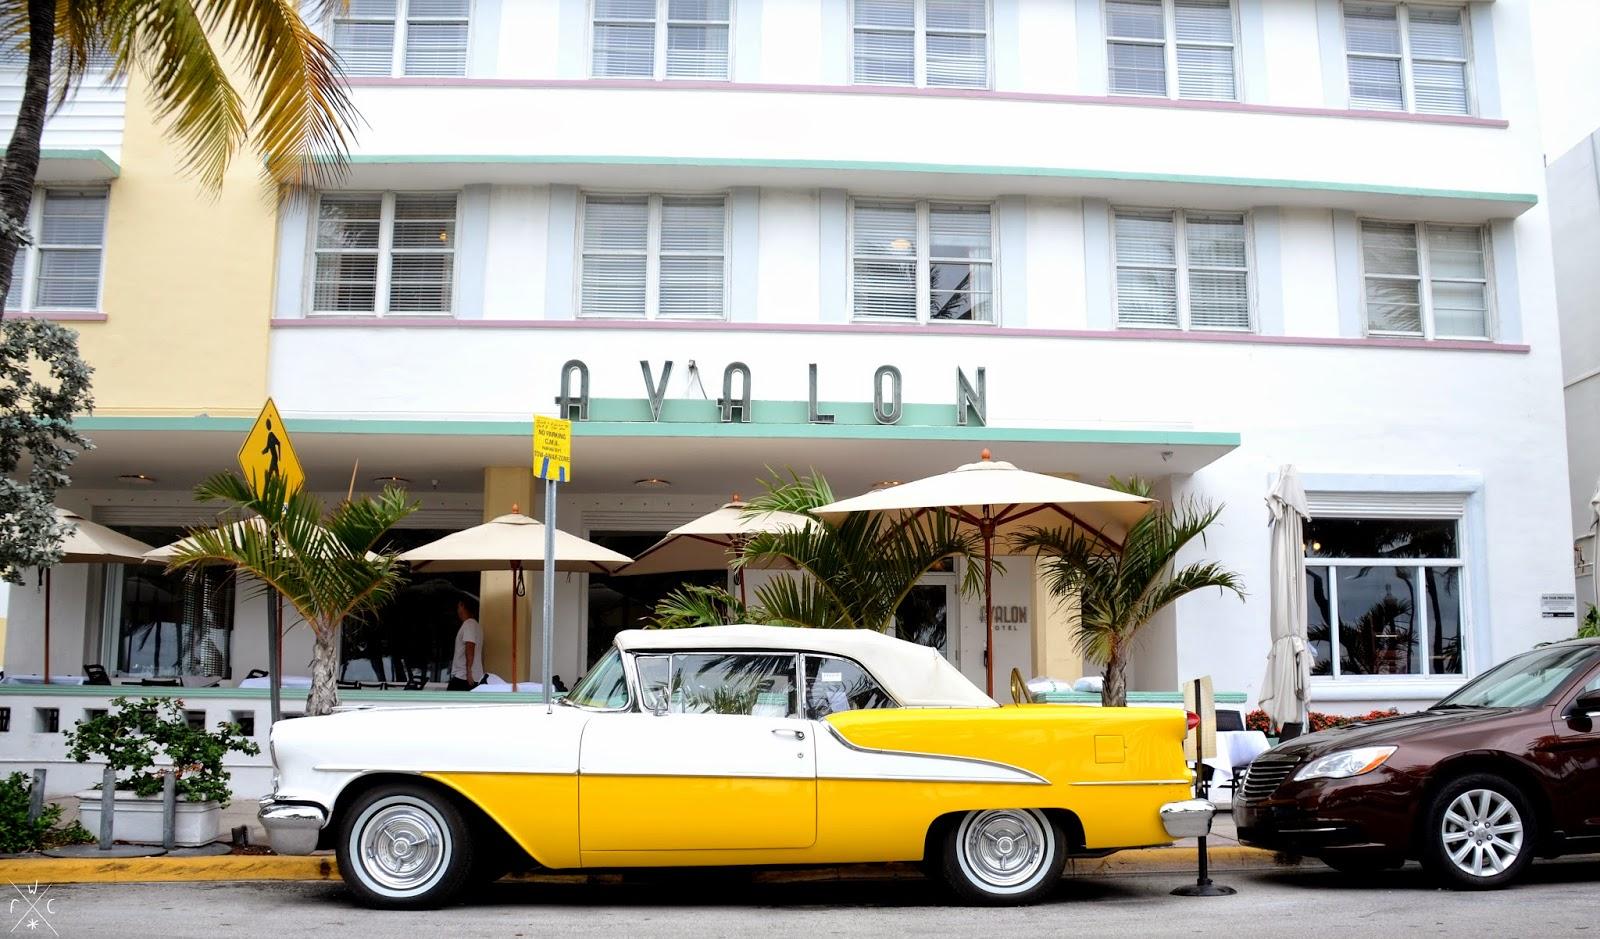 Avalon - Miami Beach, Floride, USA - Art Déco